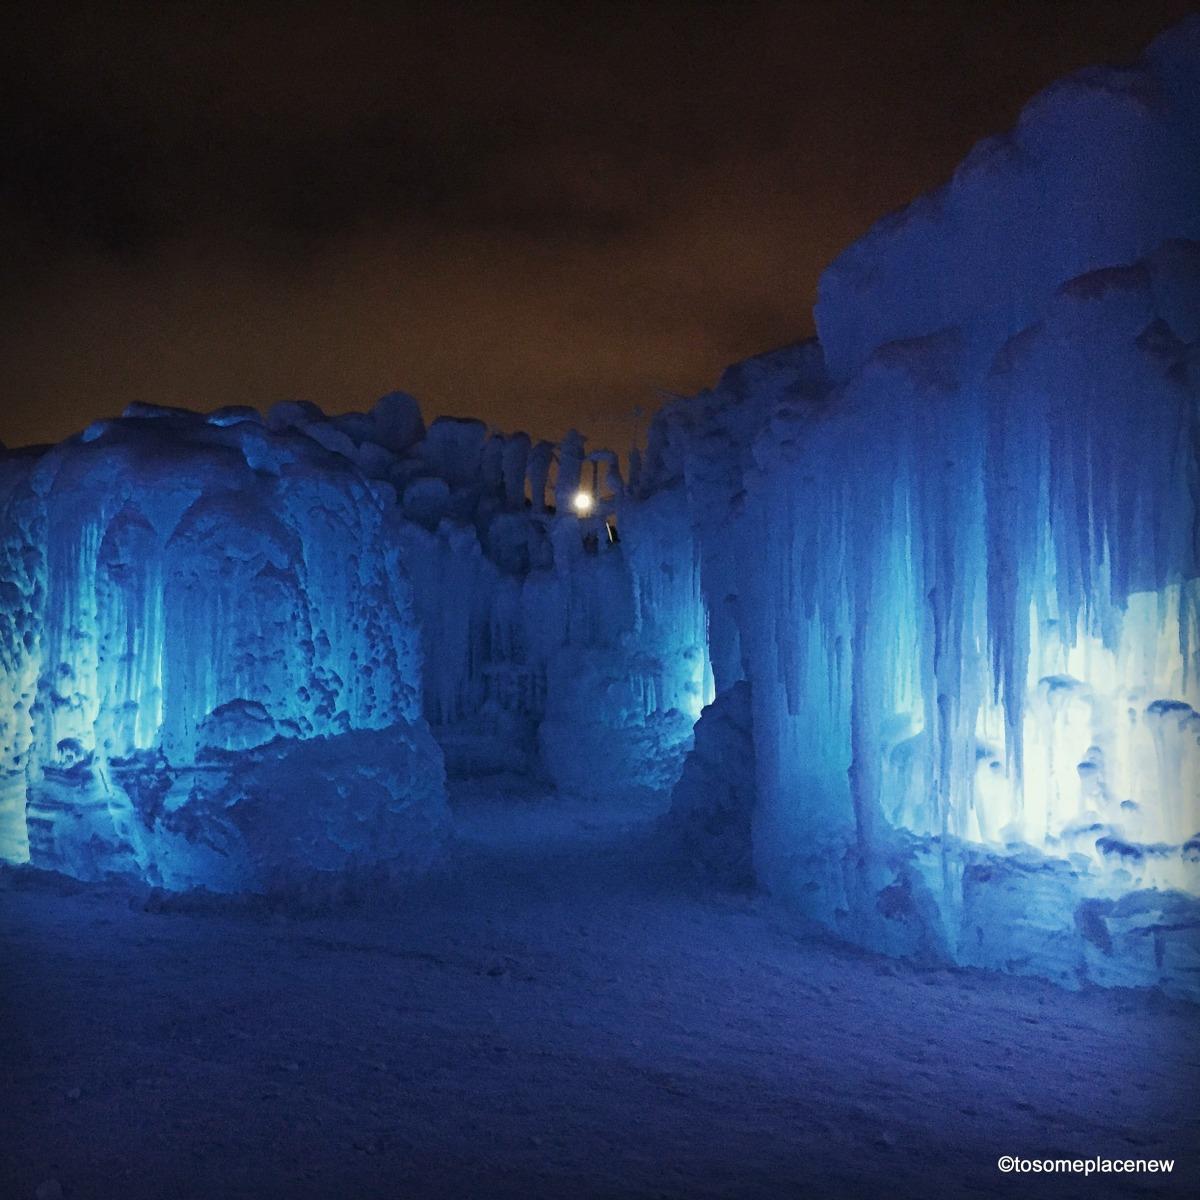 ice castle by kimesama - photo #37